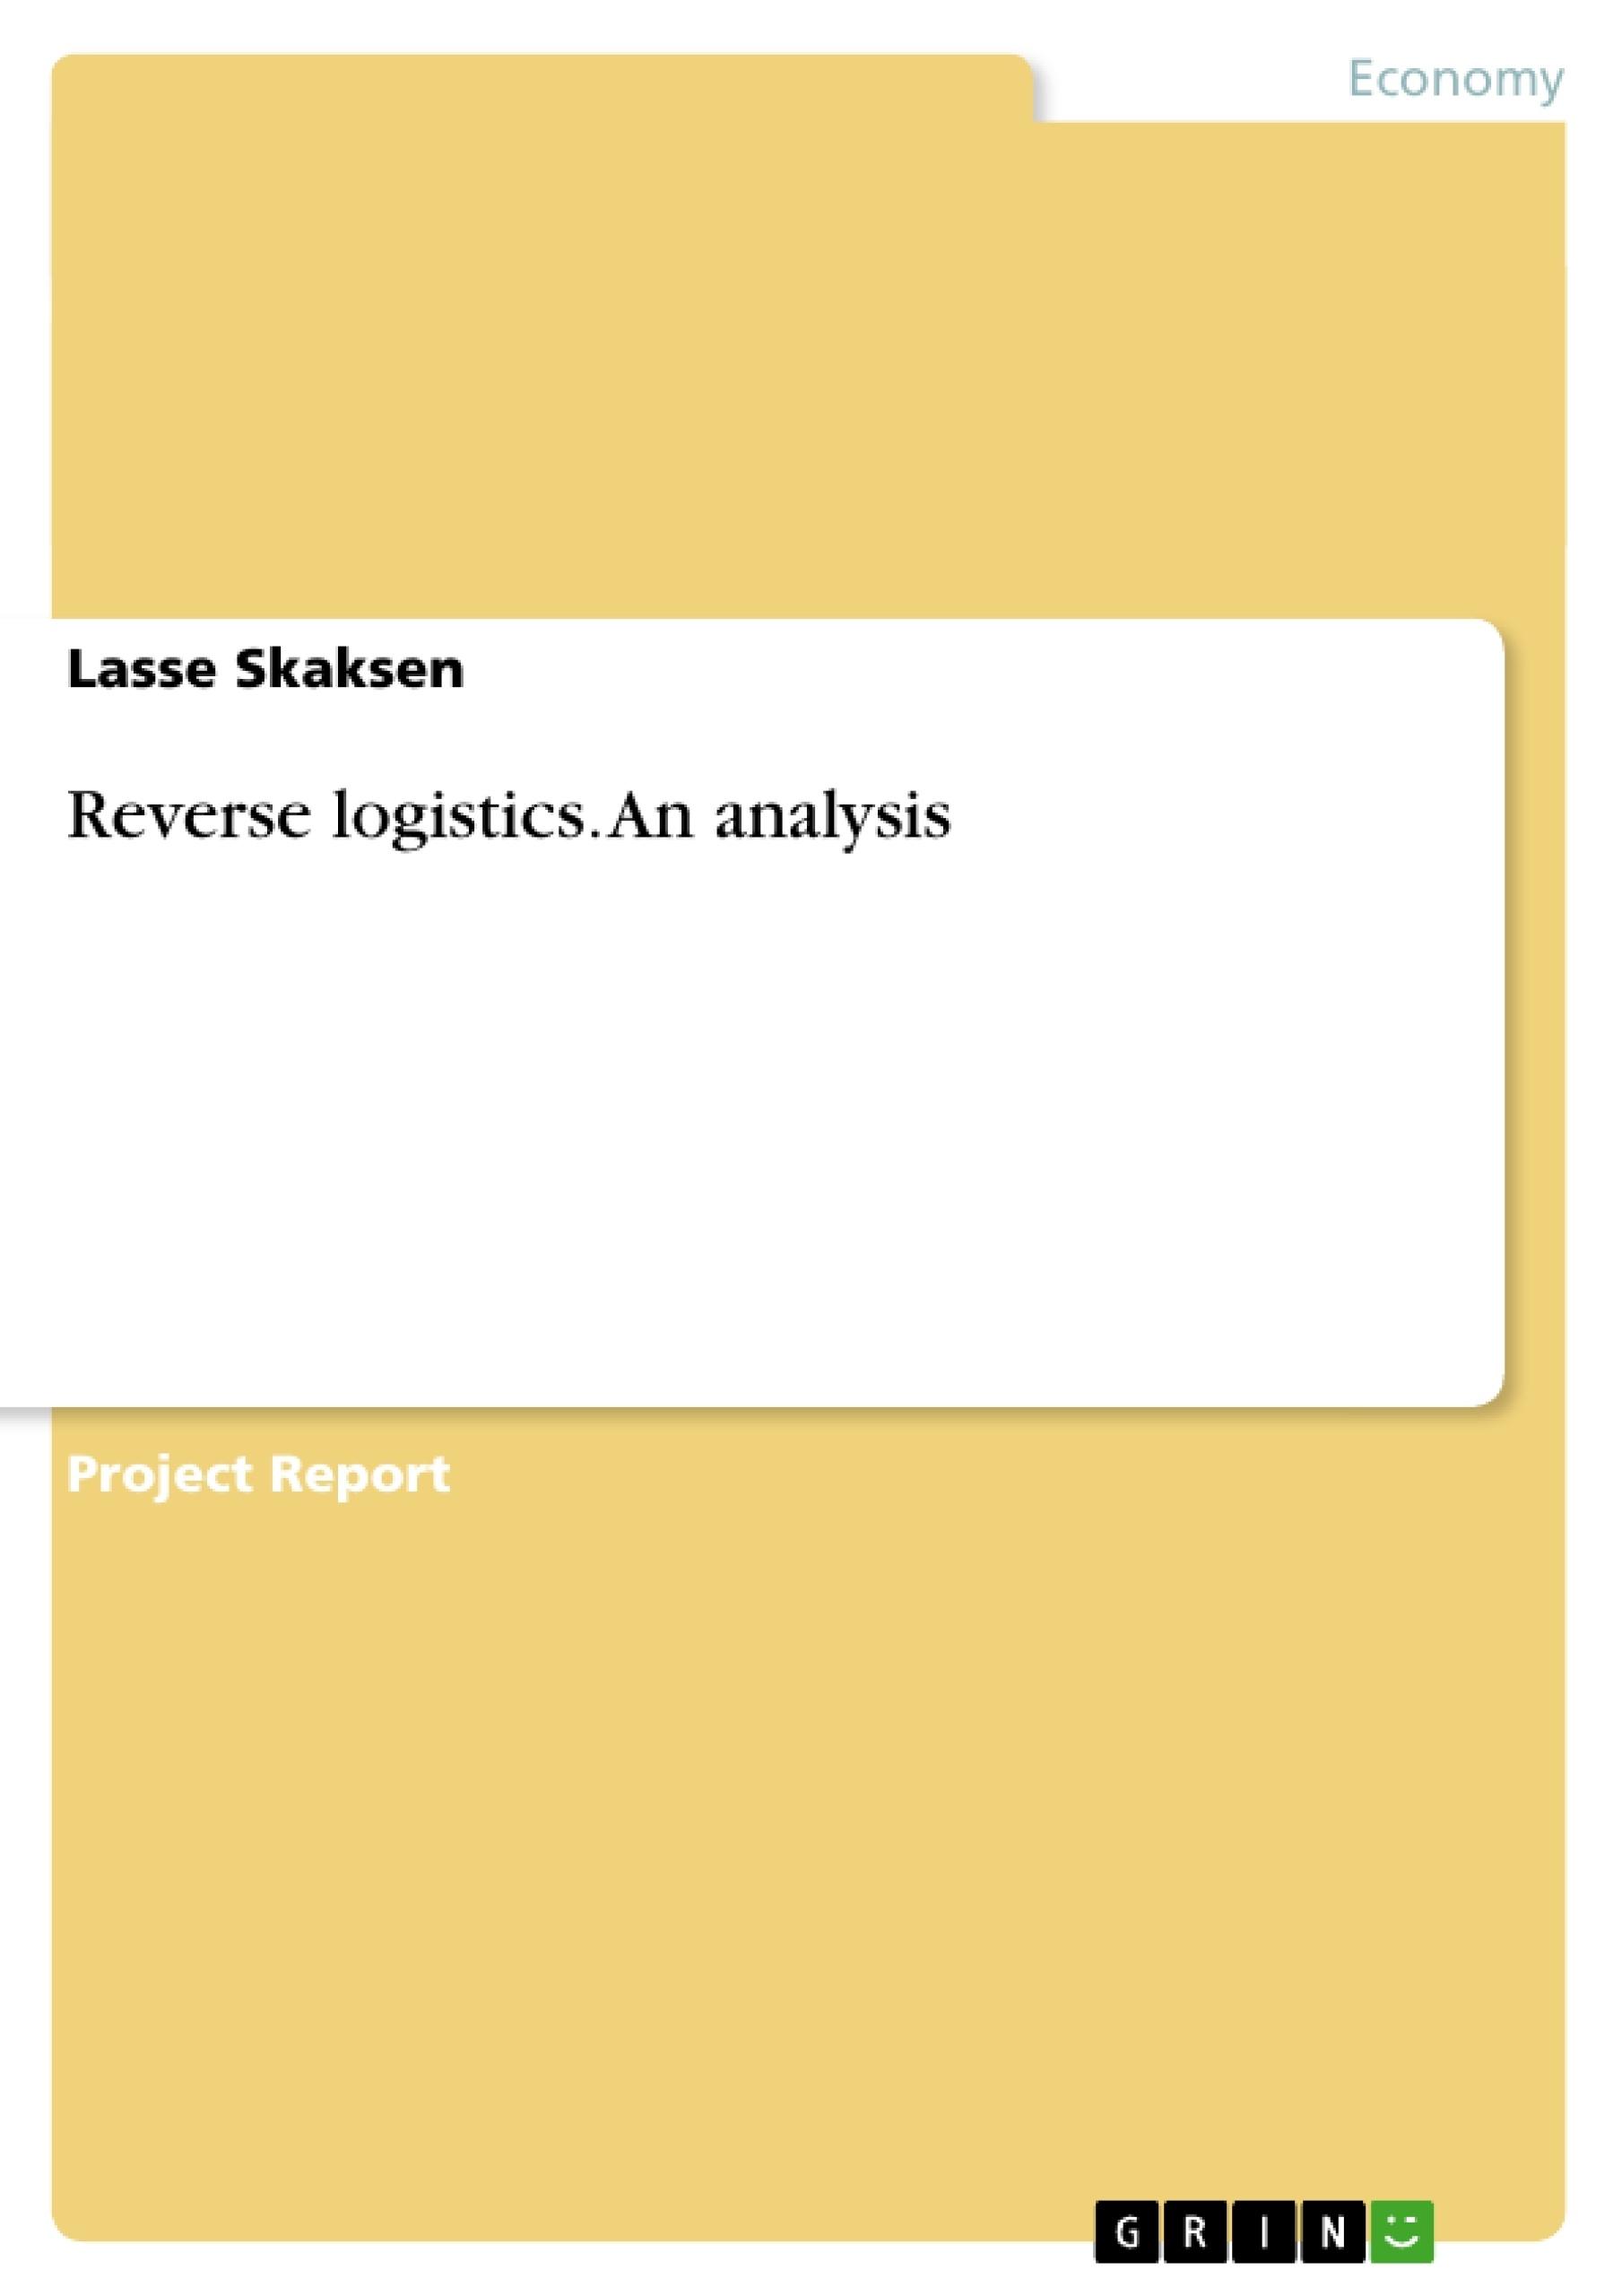 Title: Reverse logistics. An analysis